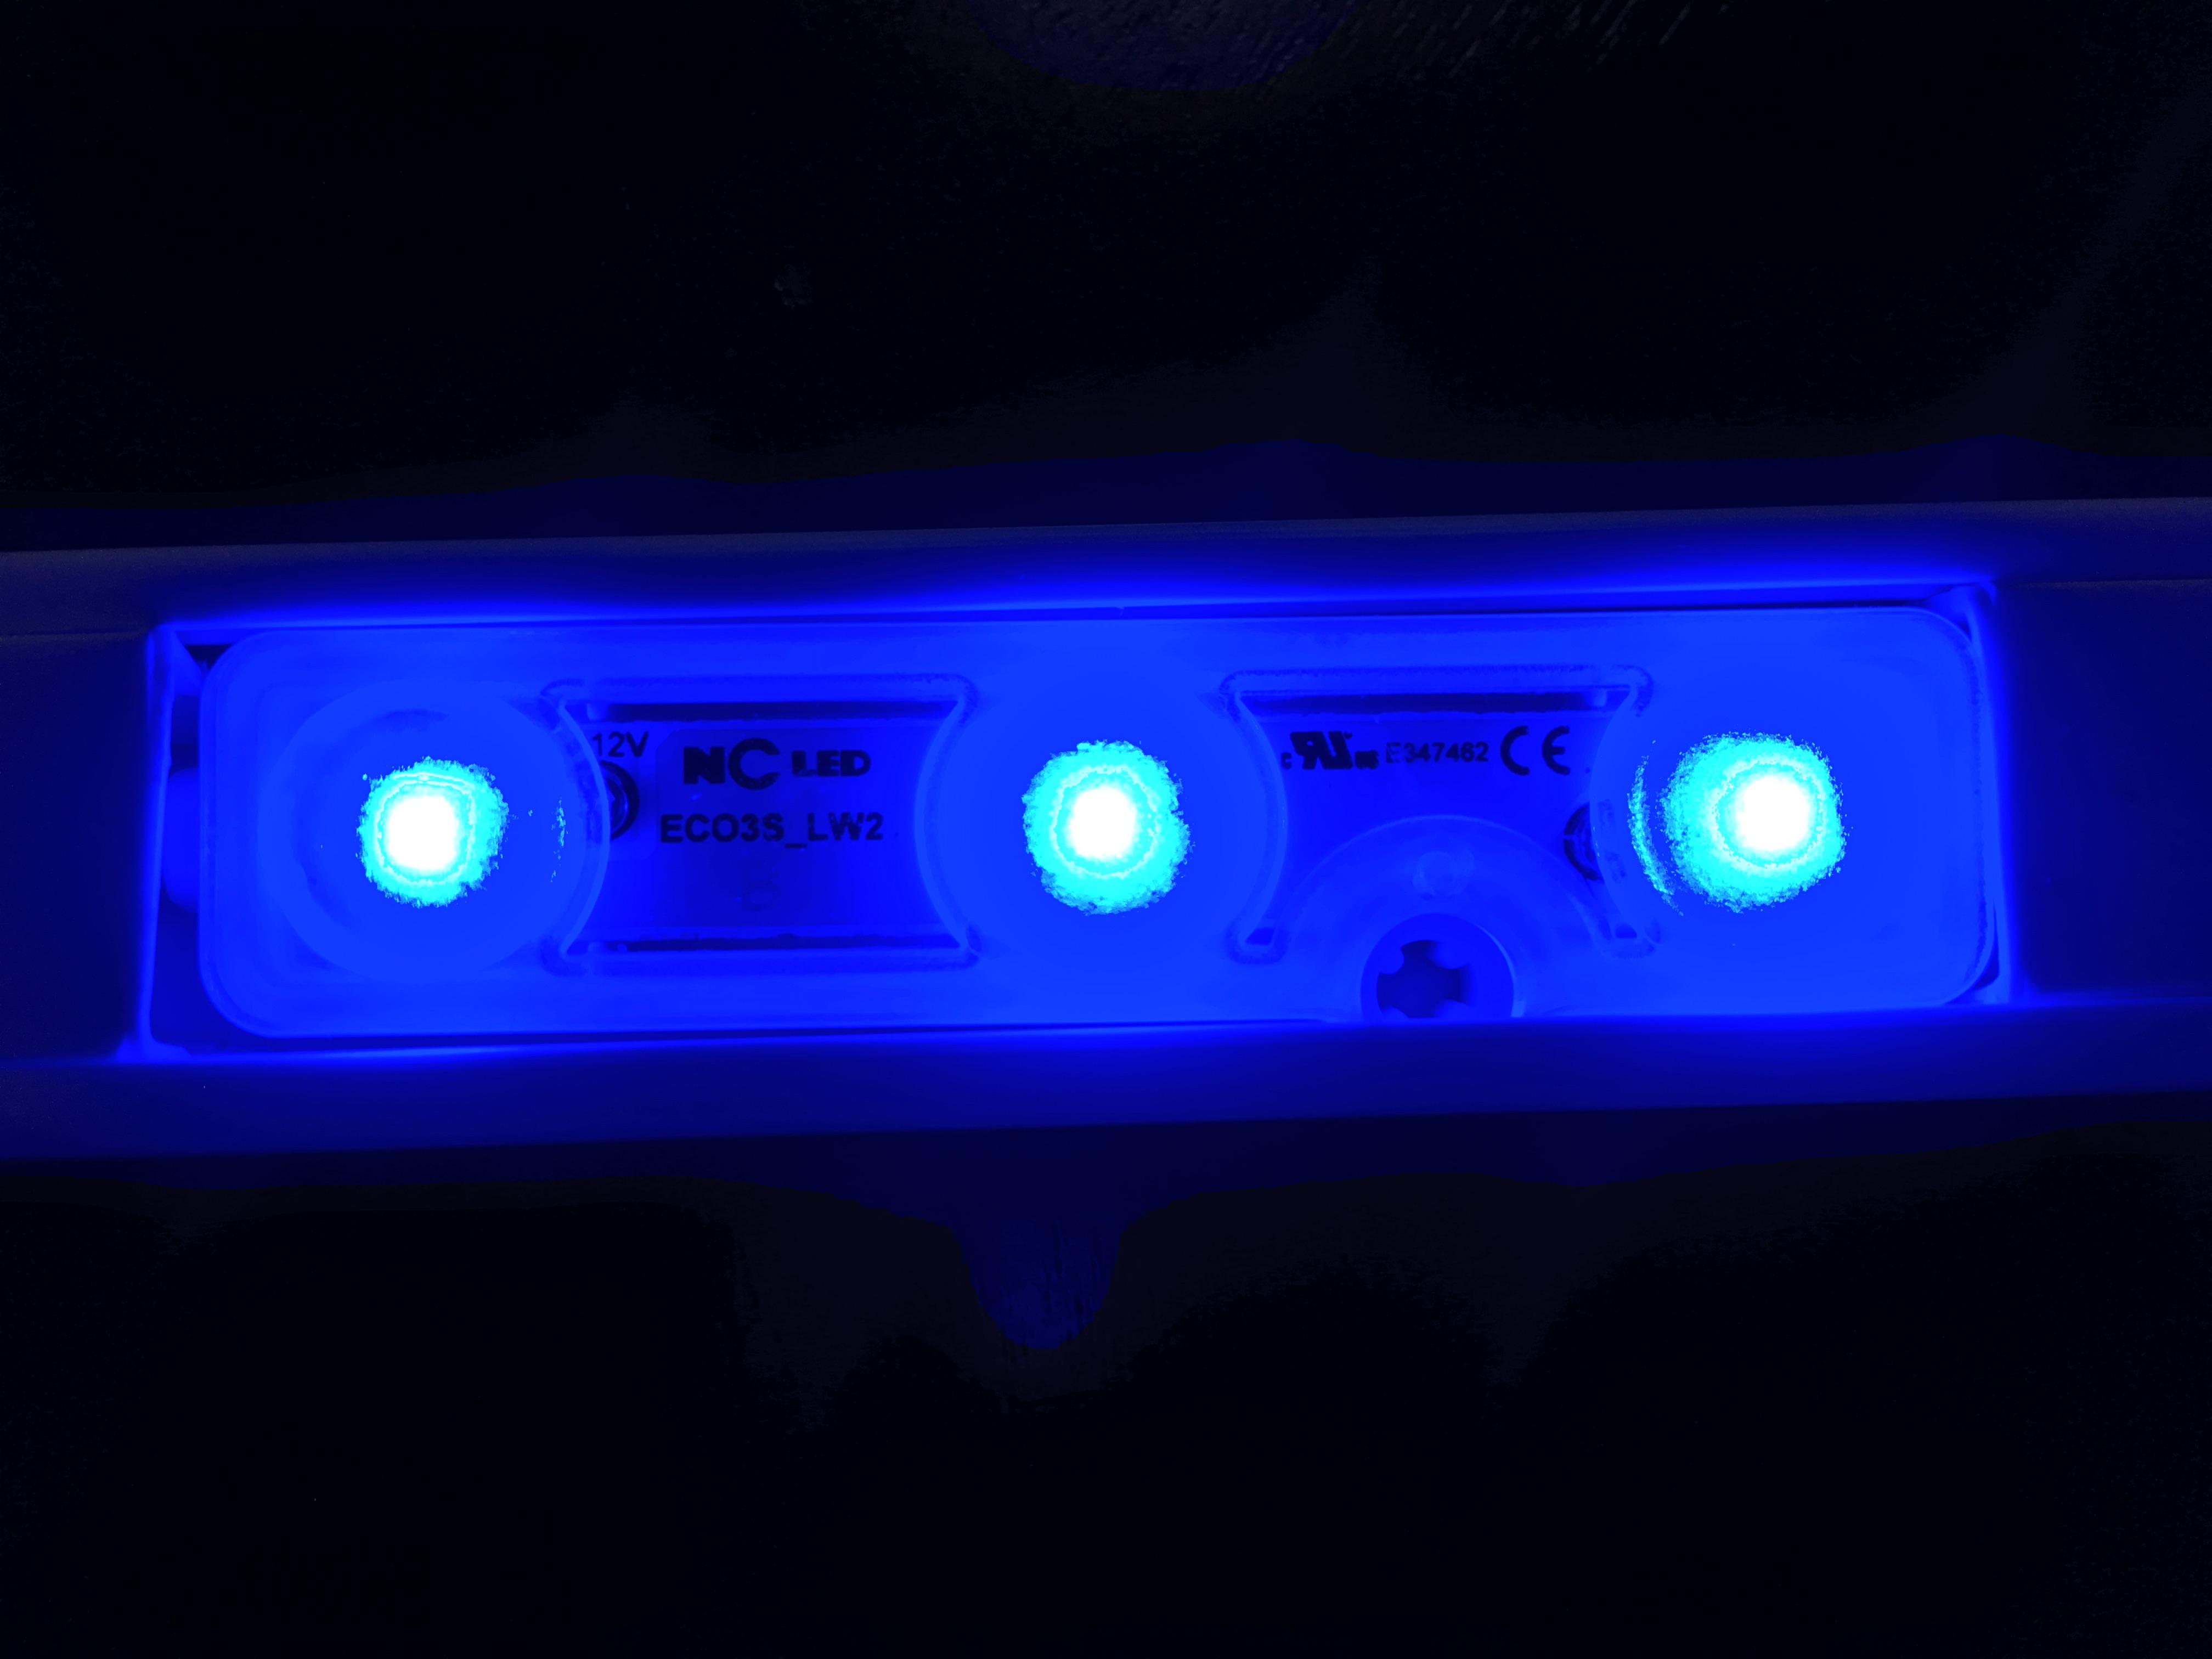 NcLED Module Wide Angle LED Blue (100 PCs)